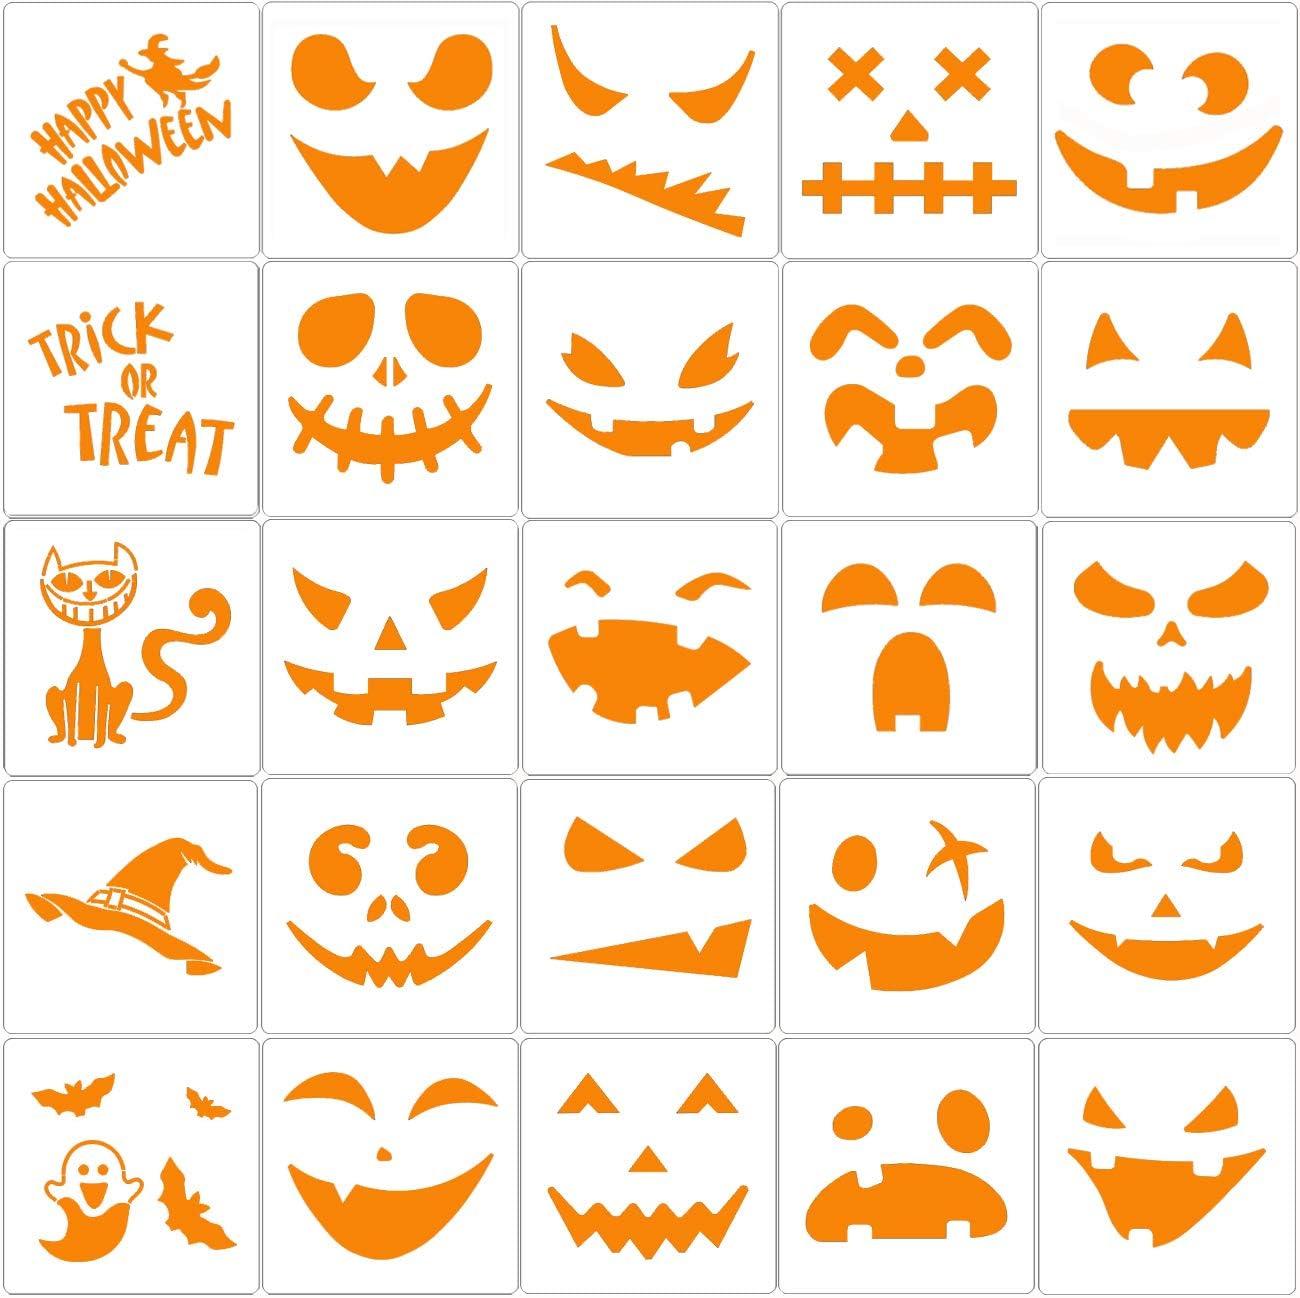 Amazon Com 25 Pieces Halloween Drawing Stencils Pumpkin Faces Stencil For Diy Pumpkin Carving Reusable Painting Templates For Kids